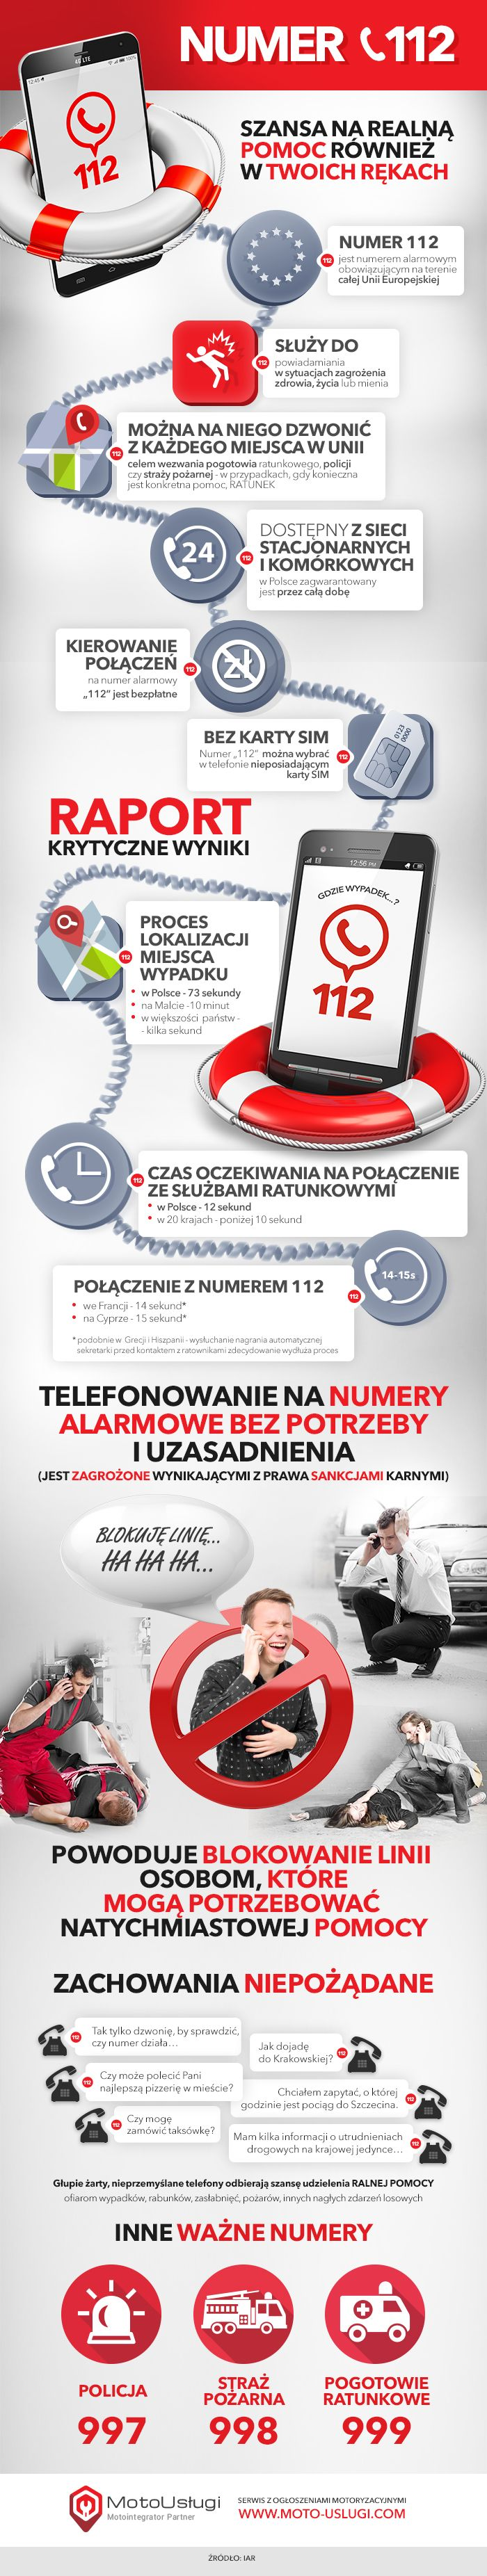 Numer alarmowy 112. Infografika